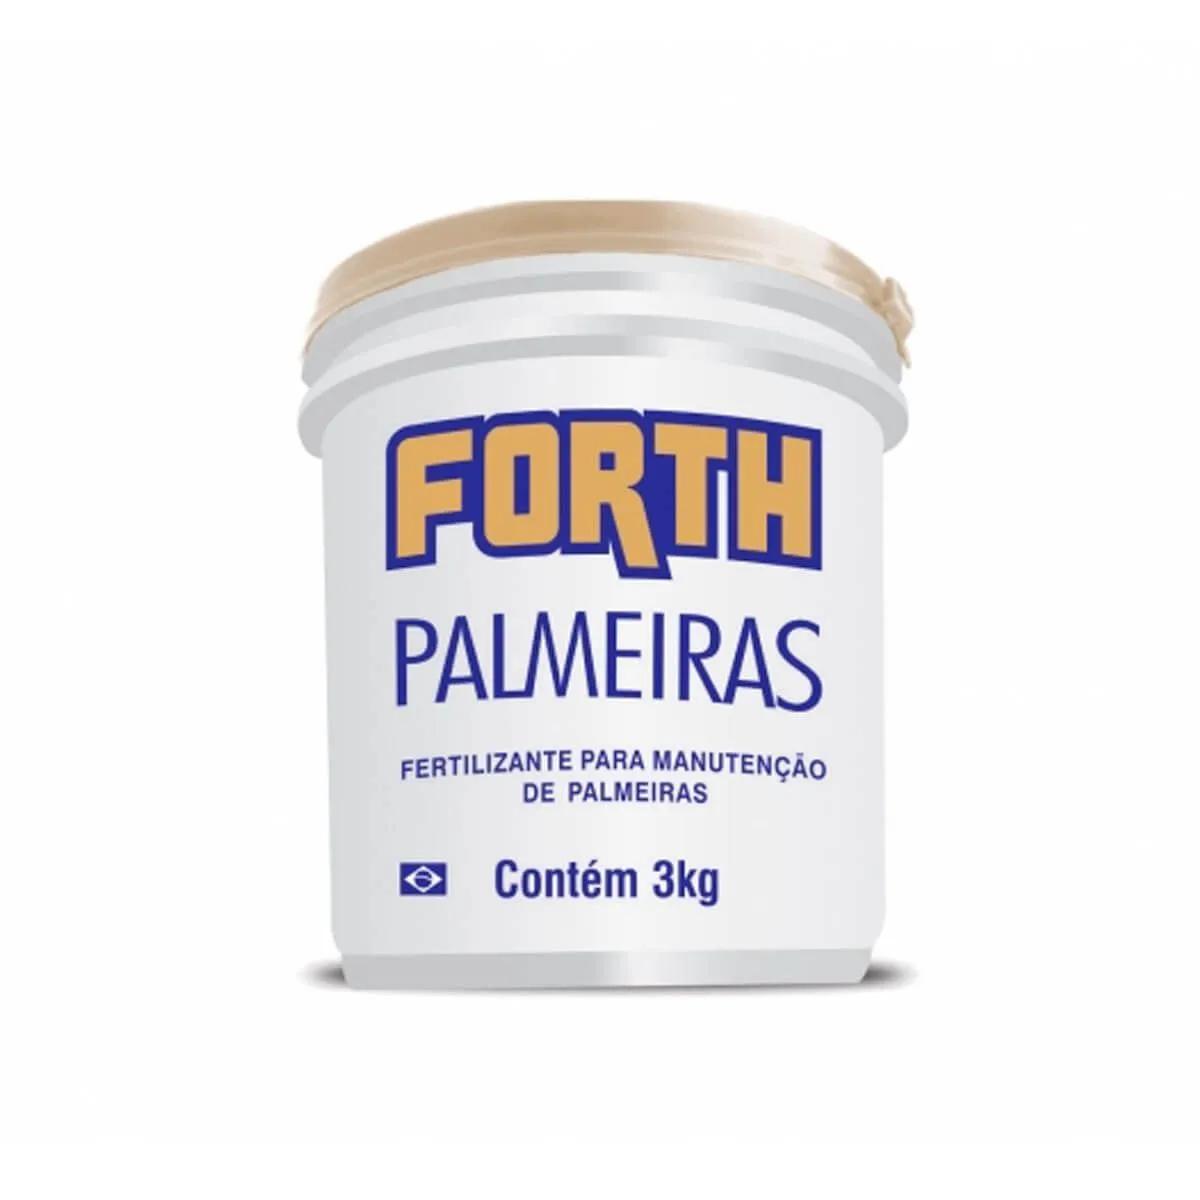 Fertilizante para plantas Forth Palmeiras 3kg  - Vasos Raiz Loja Oficial